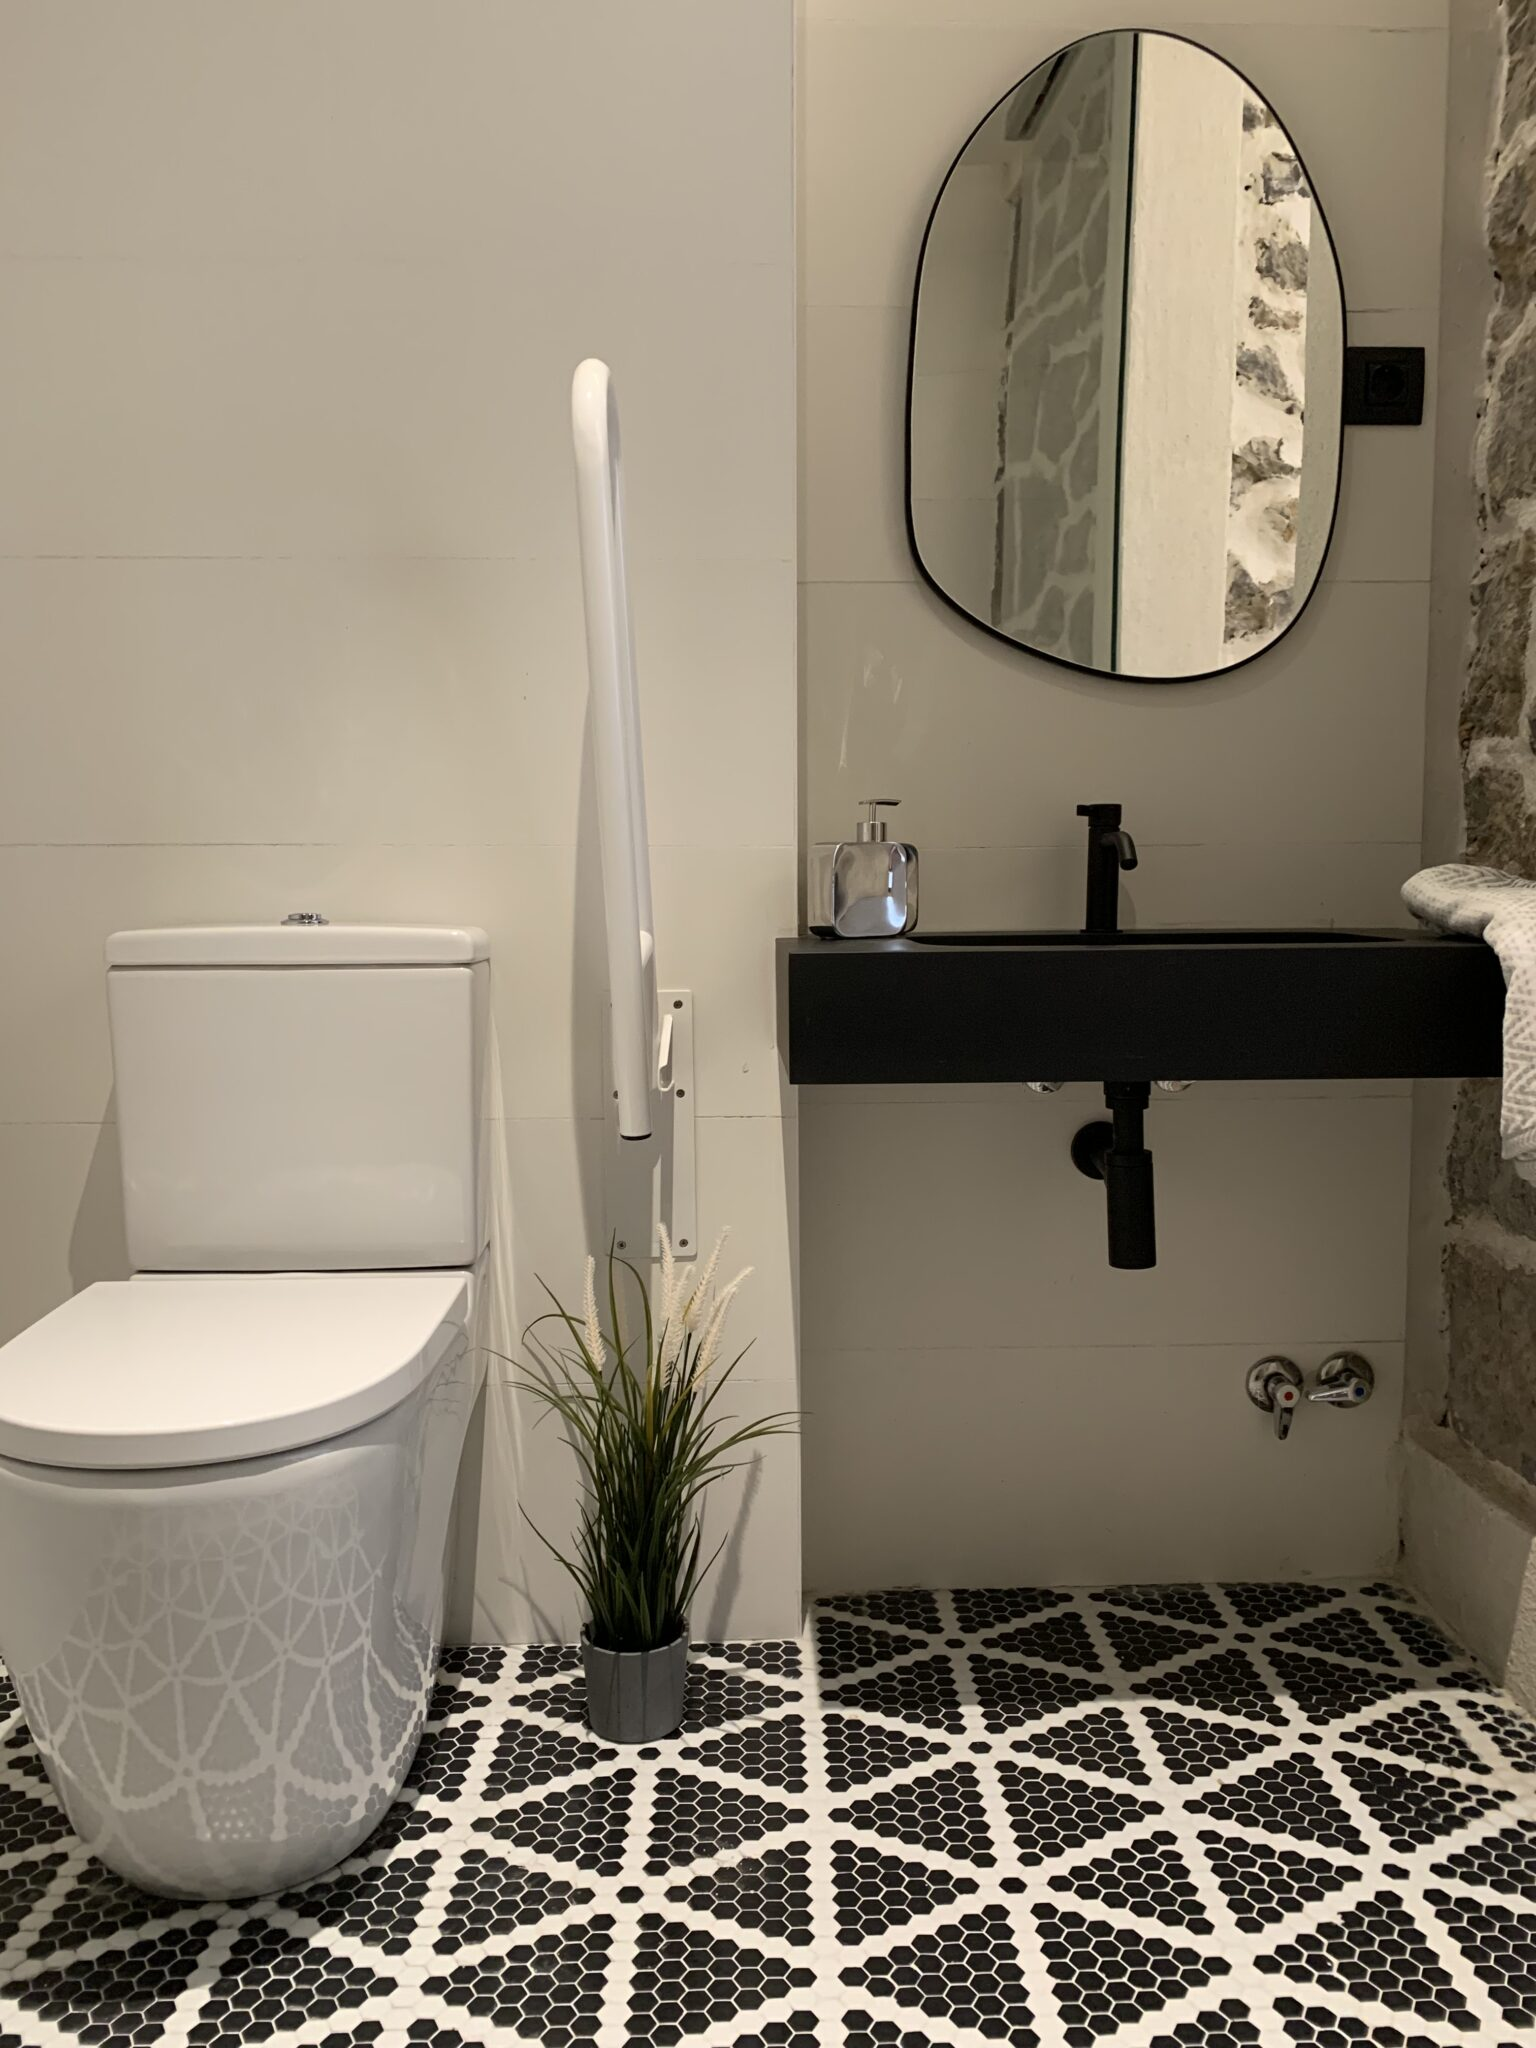 Proyecto-hisbalit-Baño adaptado con suelo Sonata | Ducha | Black & White-baNo sonata black white hotel arimune baNo adaptado 1